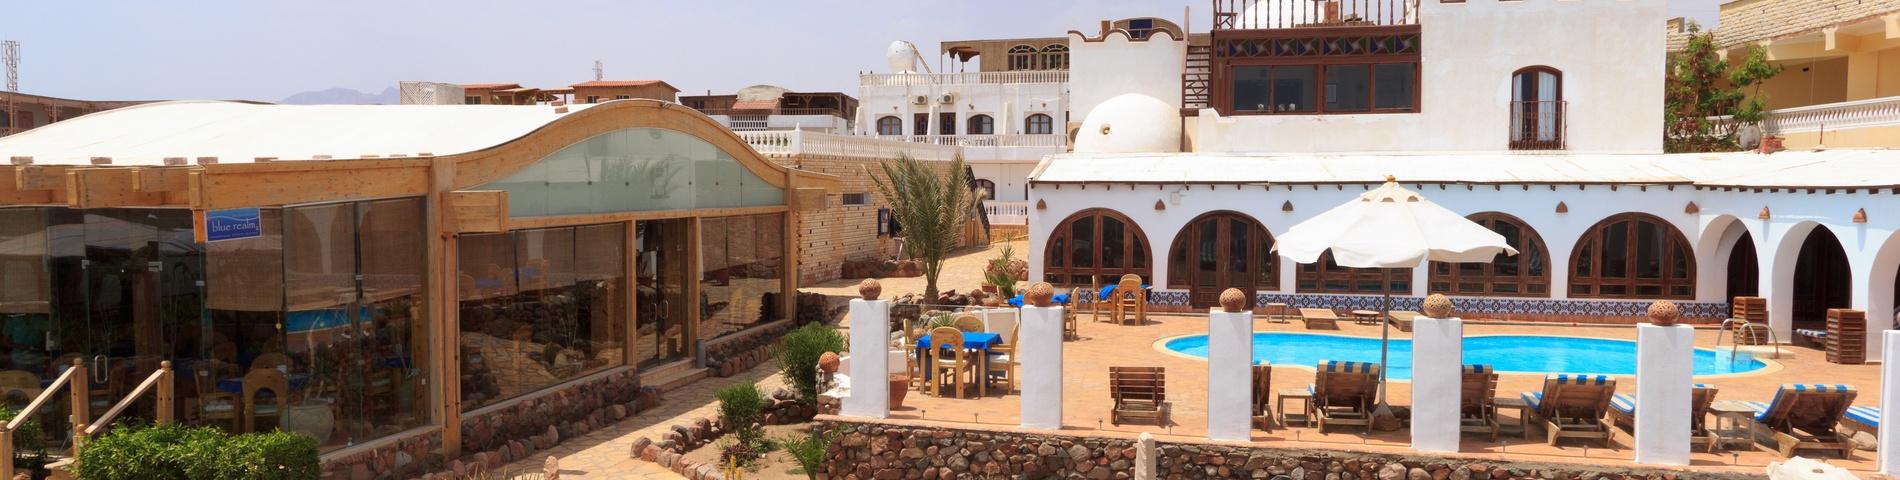 Blue Beach Club School Of Arabic Language รูปภาพ 1